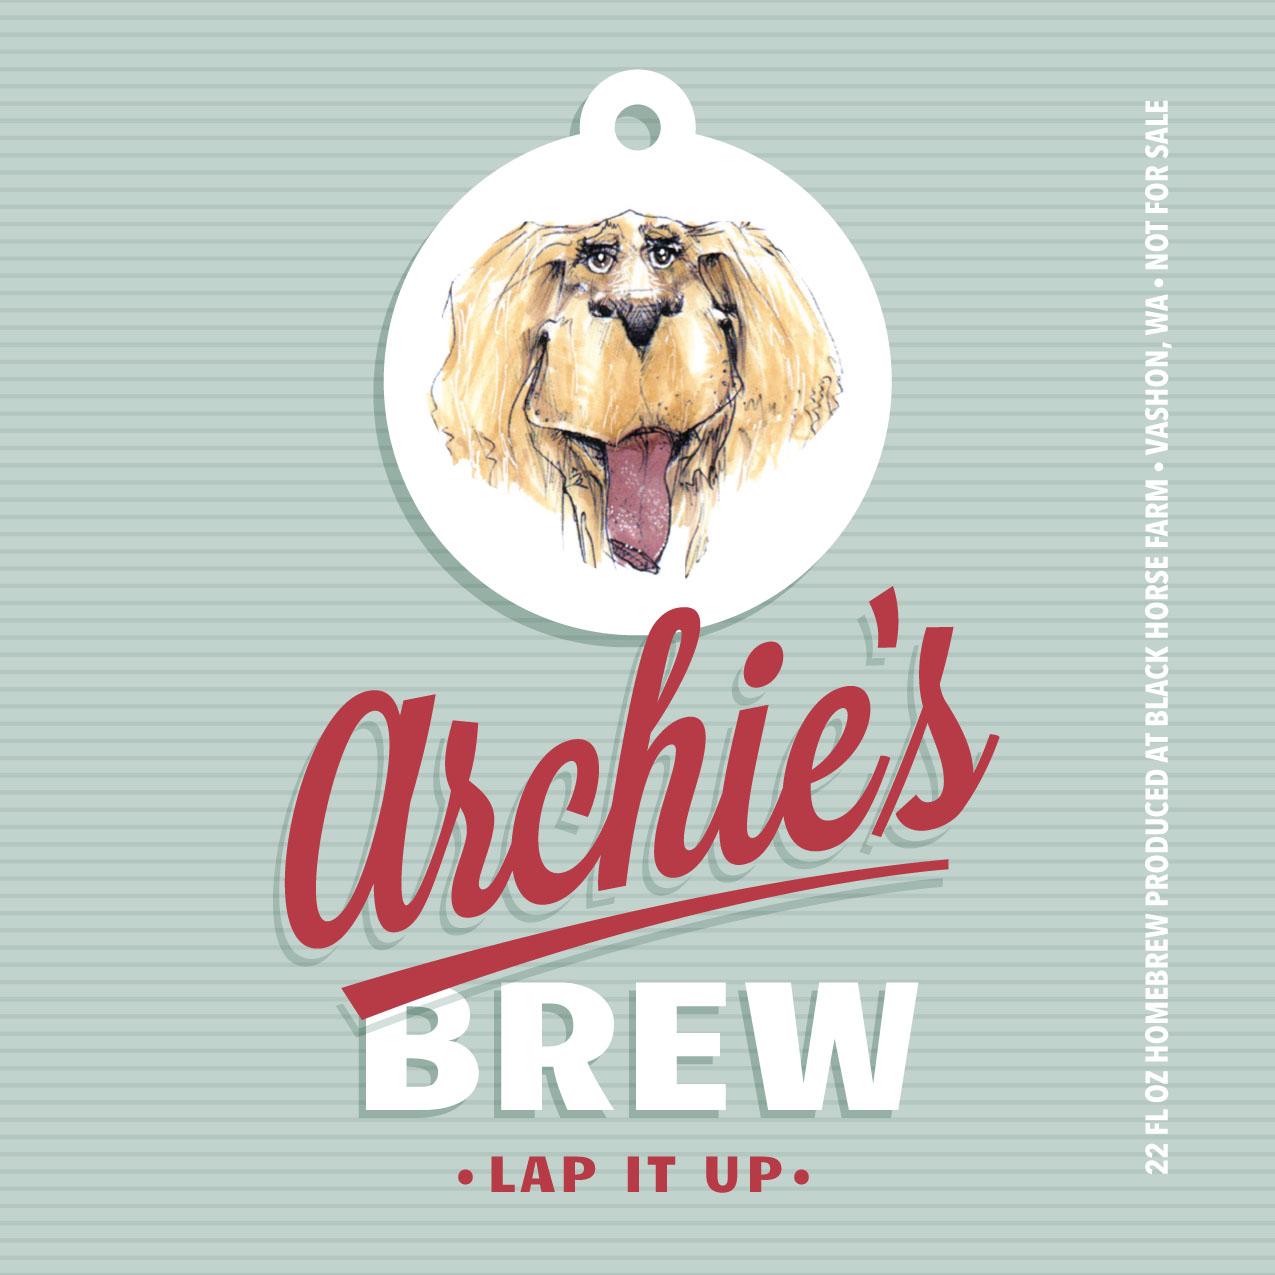 Archies Brew